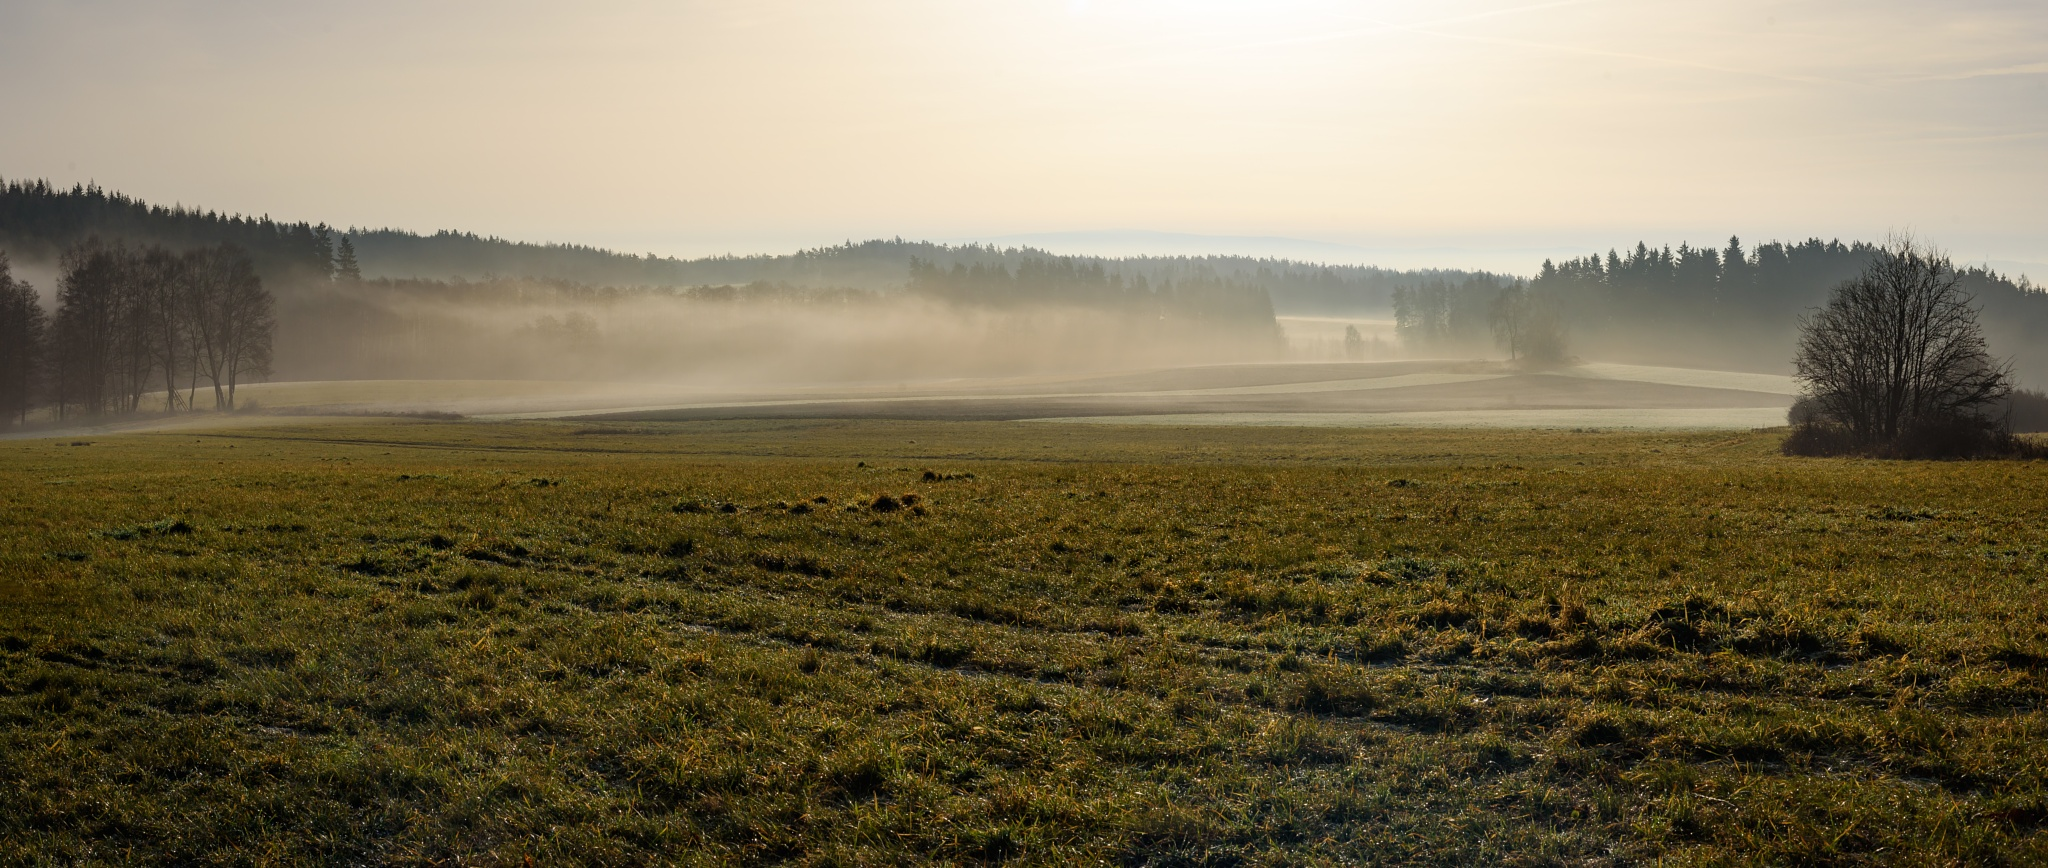 Foggy morning by Miroslav Ondříšek